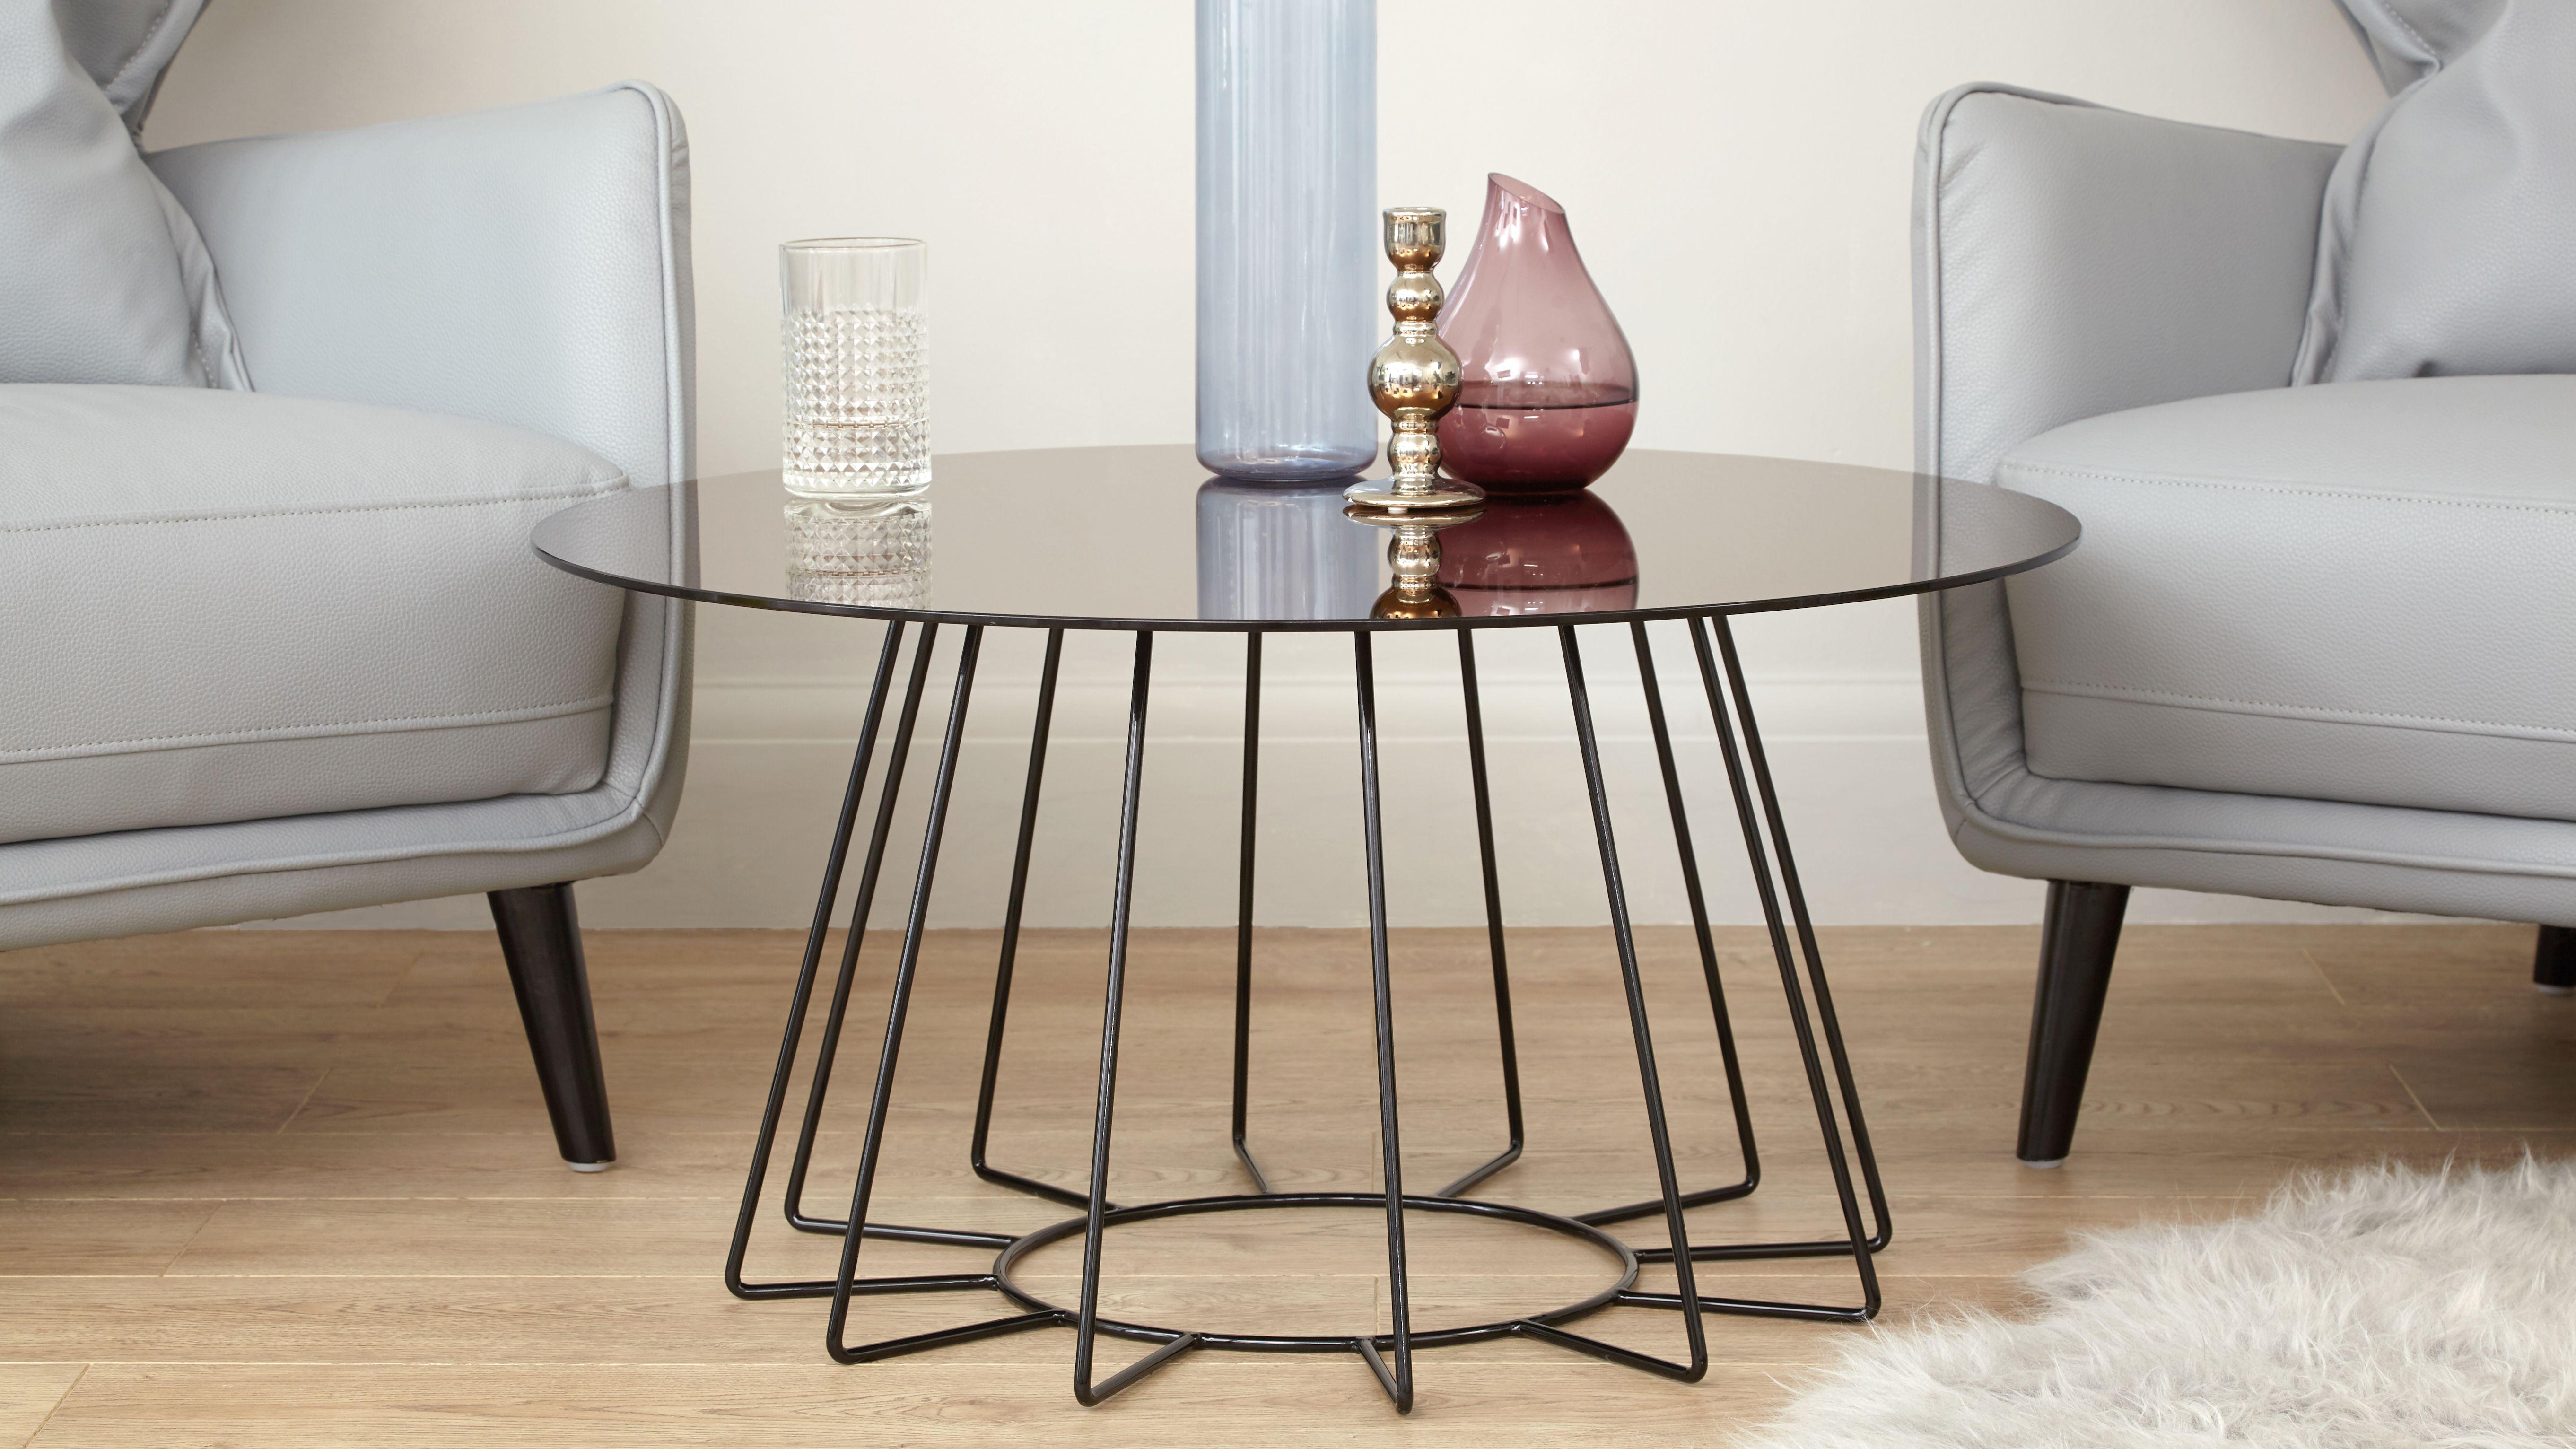 Orbit Bronze Glass Coffee Table Glass Coffee Table Coffee Table Coffee Table With Stools [ 3064 x 5447 Pixel ]